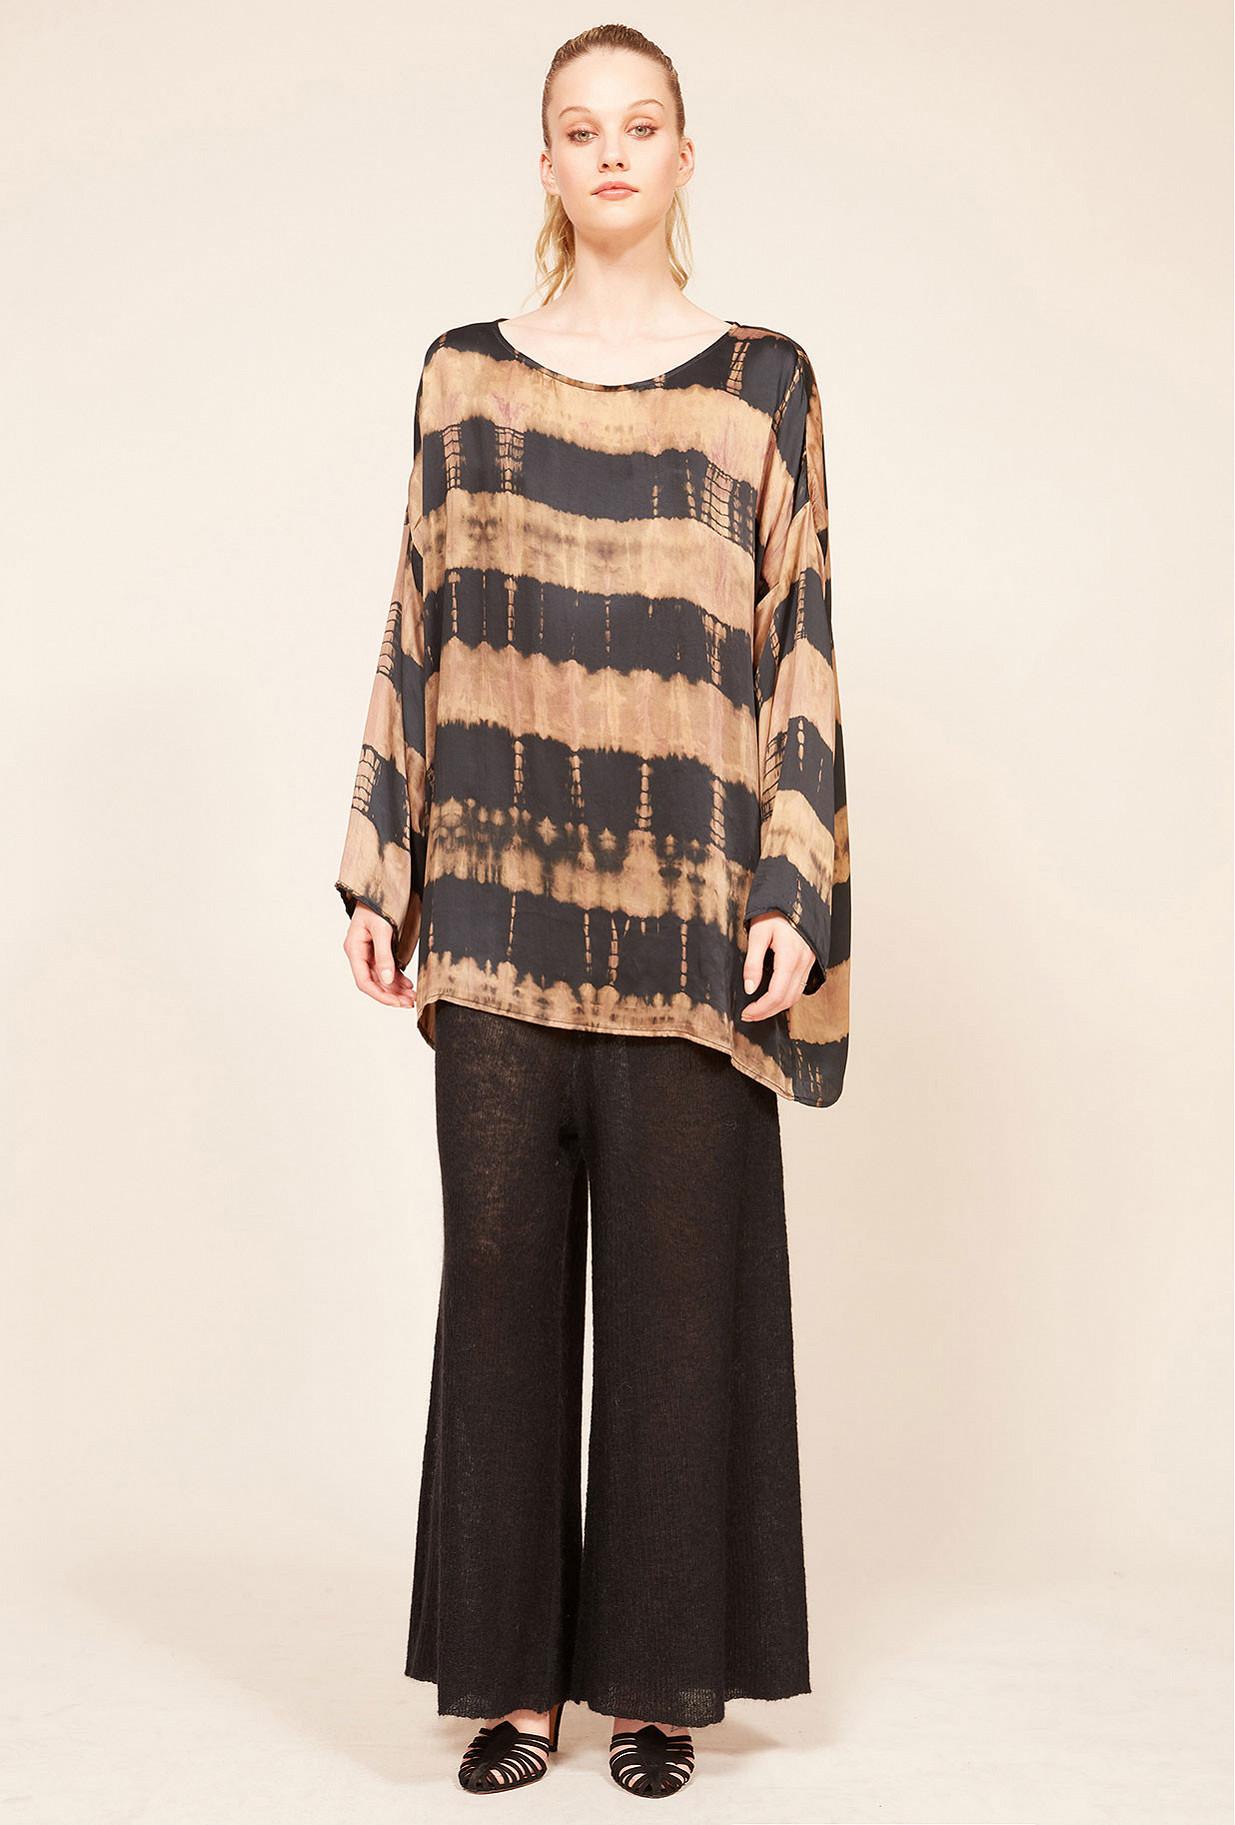 Brown print  Top  Drake Mes demoiselles fashion clothes designer Paris